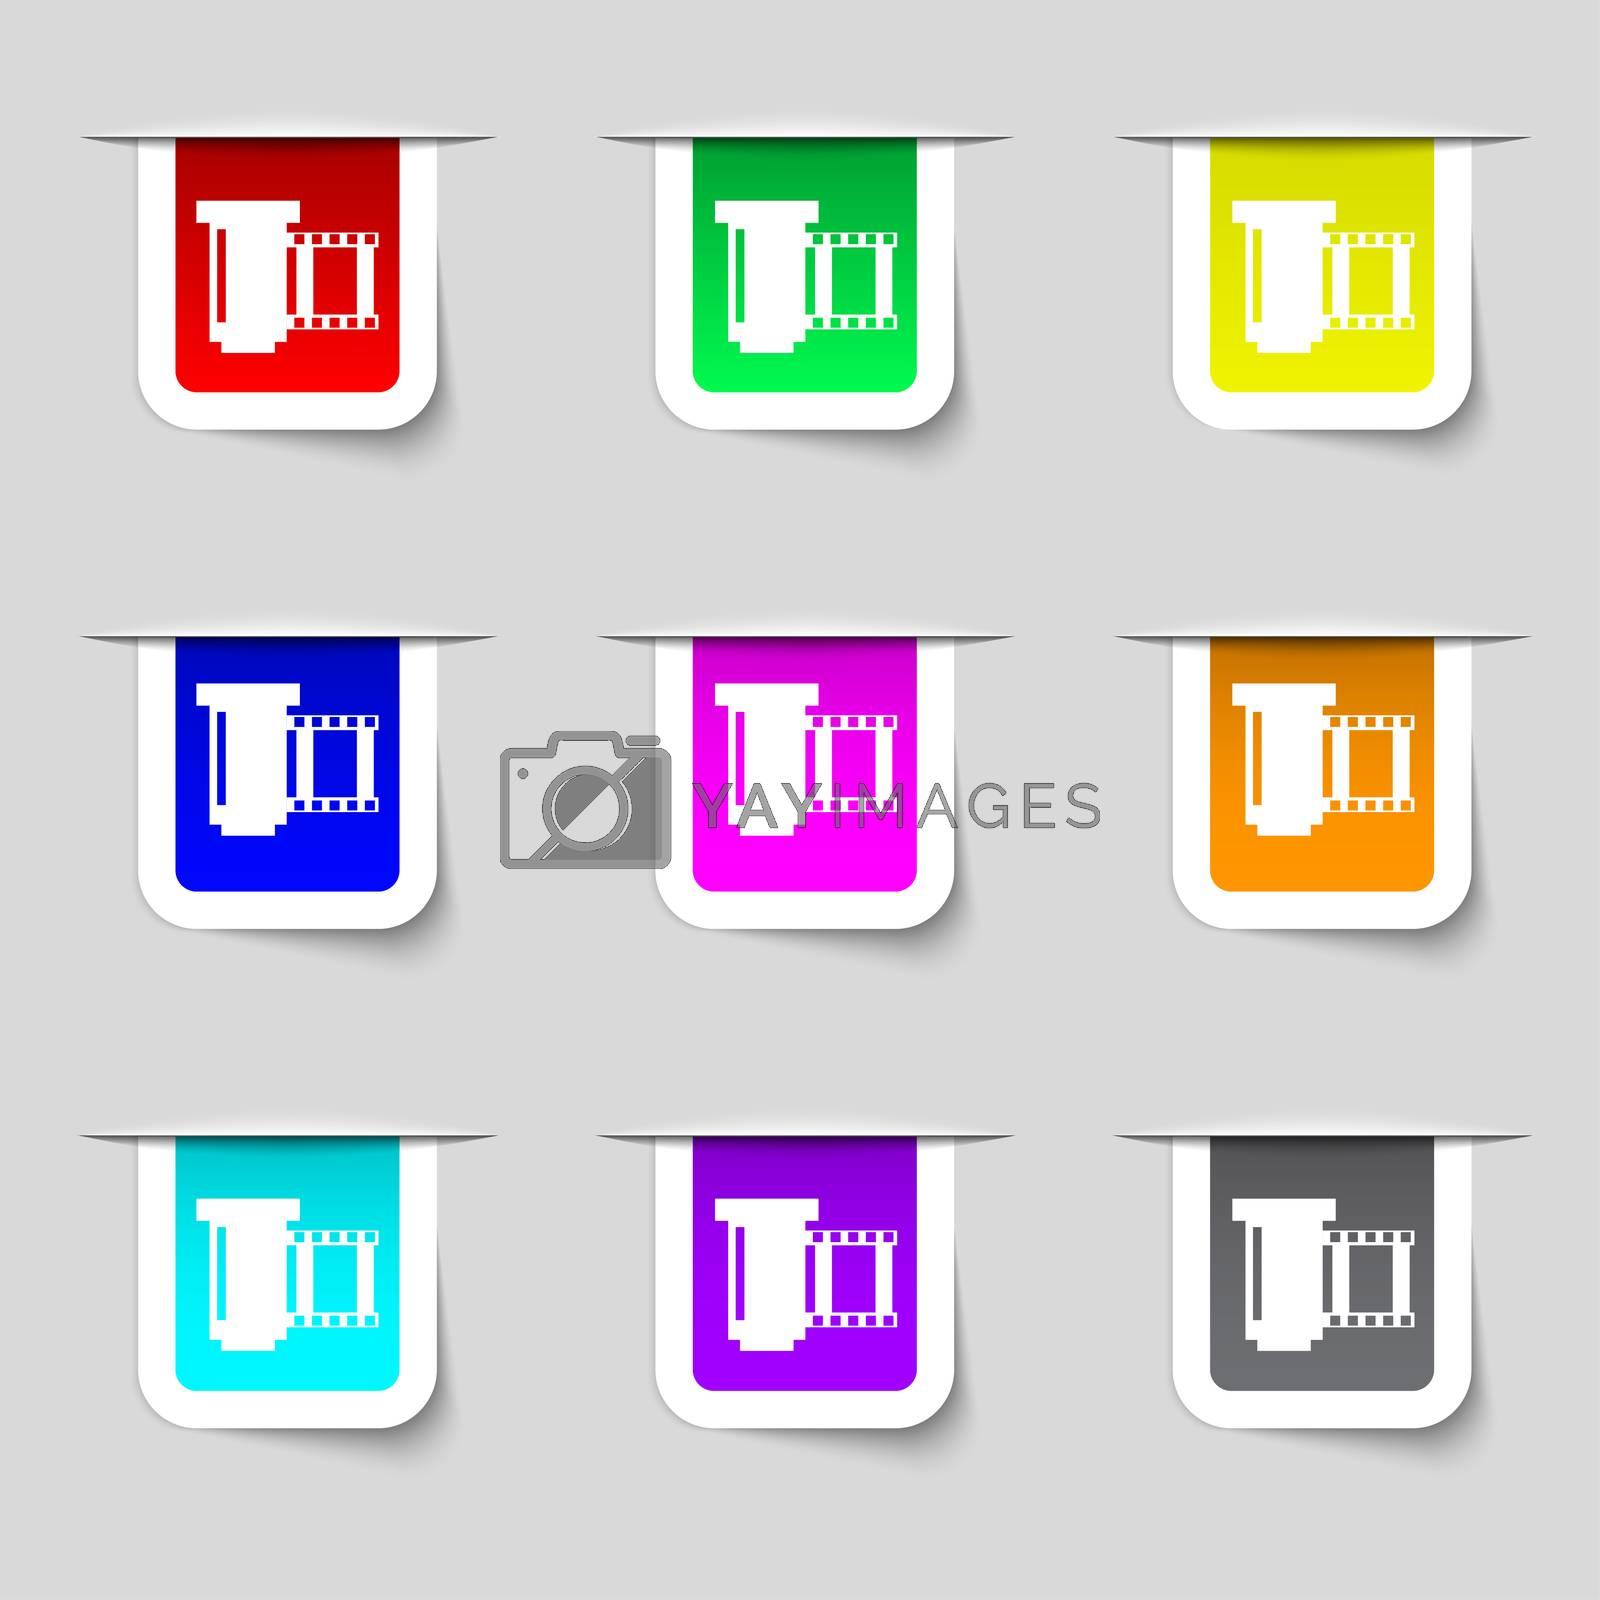 negative films icon symbol. Set of colourful buttons.  by Serhii Lohvyniuk